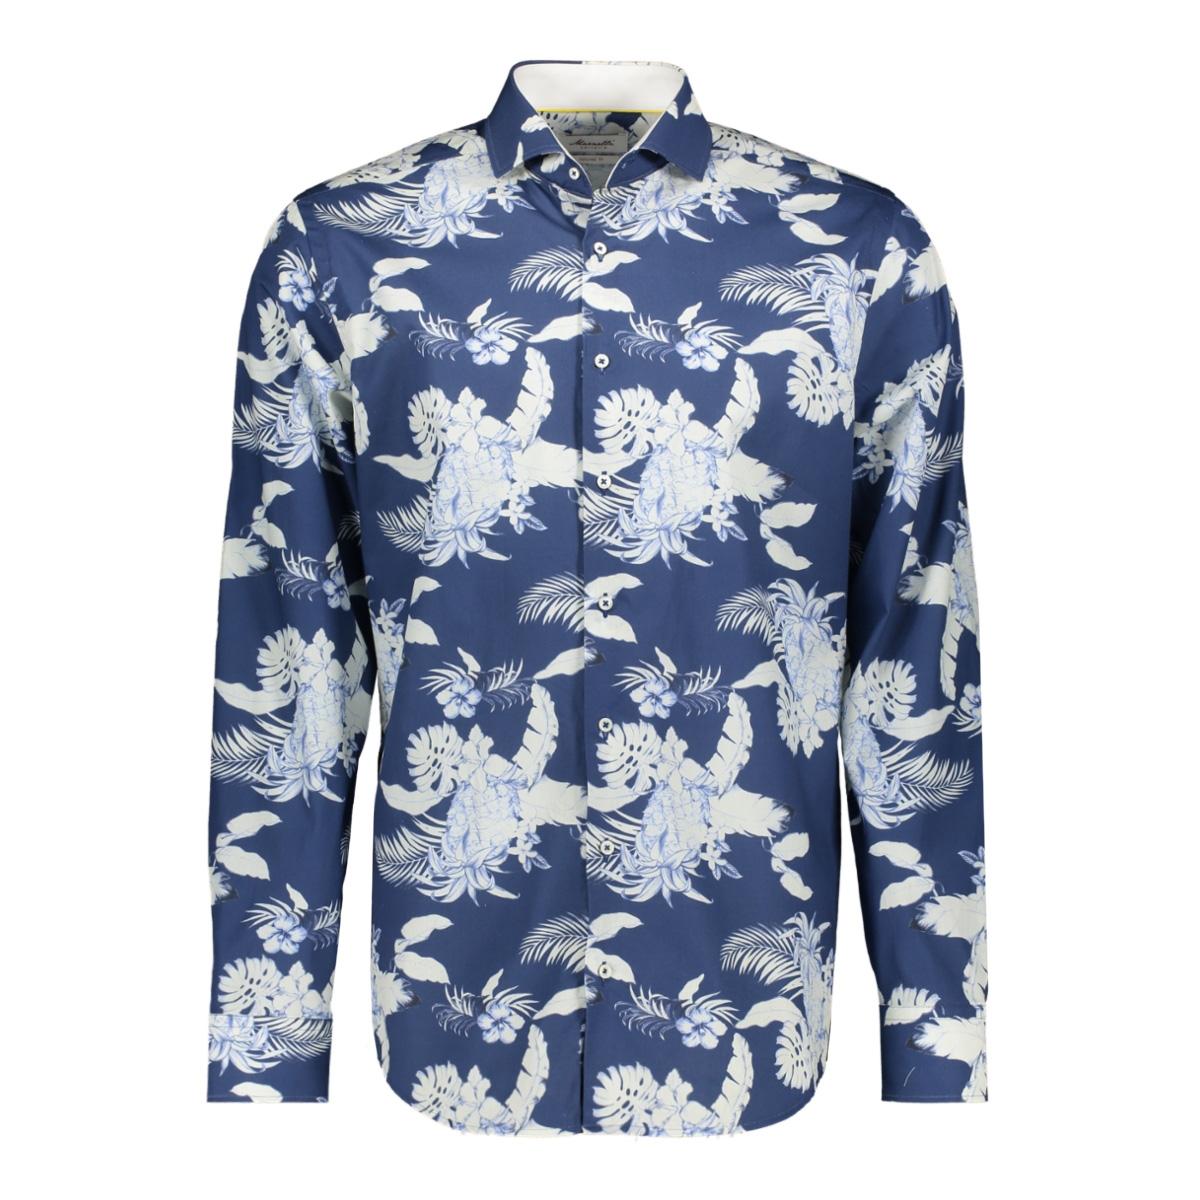 21-19sh101-5 marnelli overhemd 314